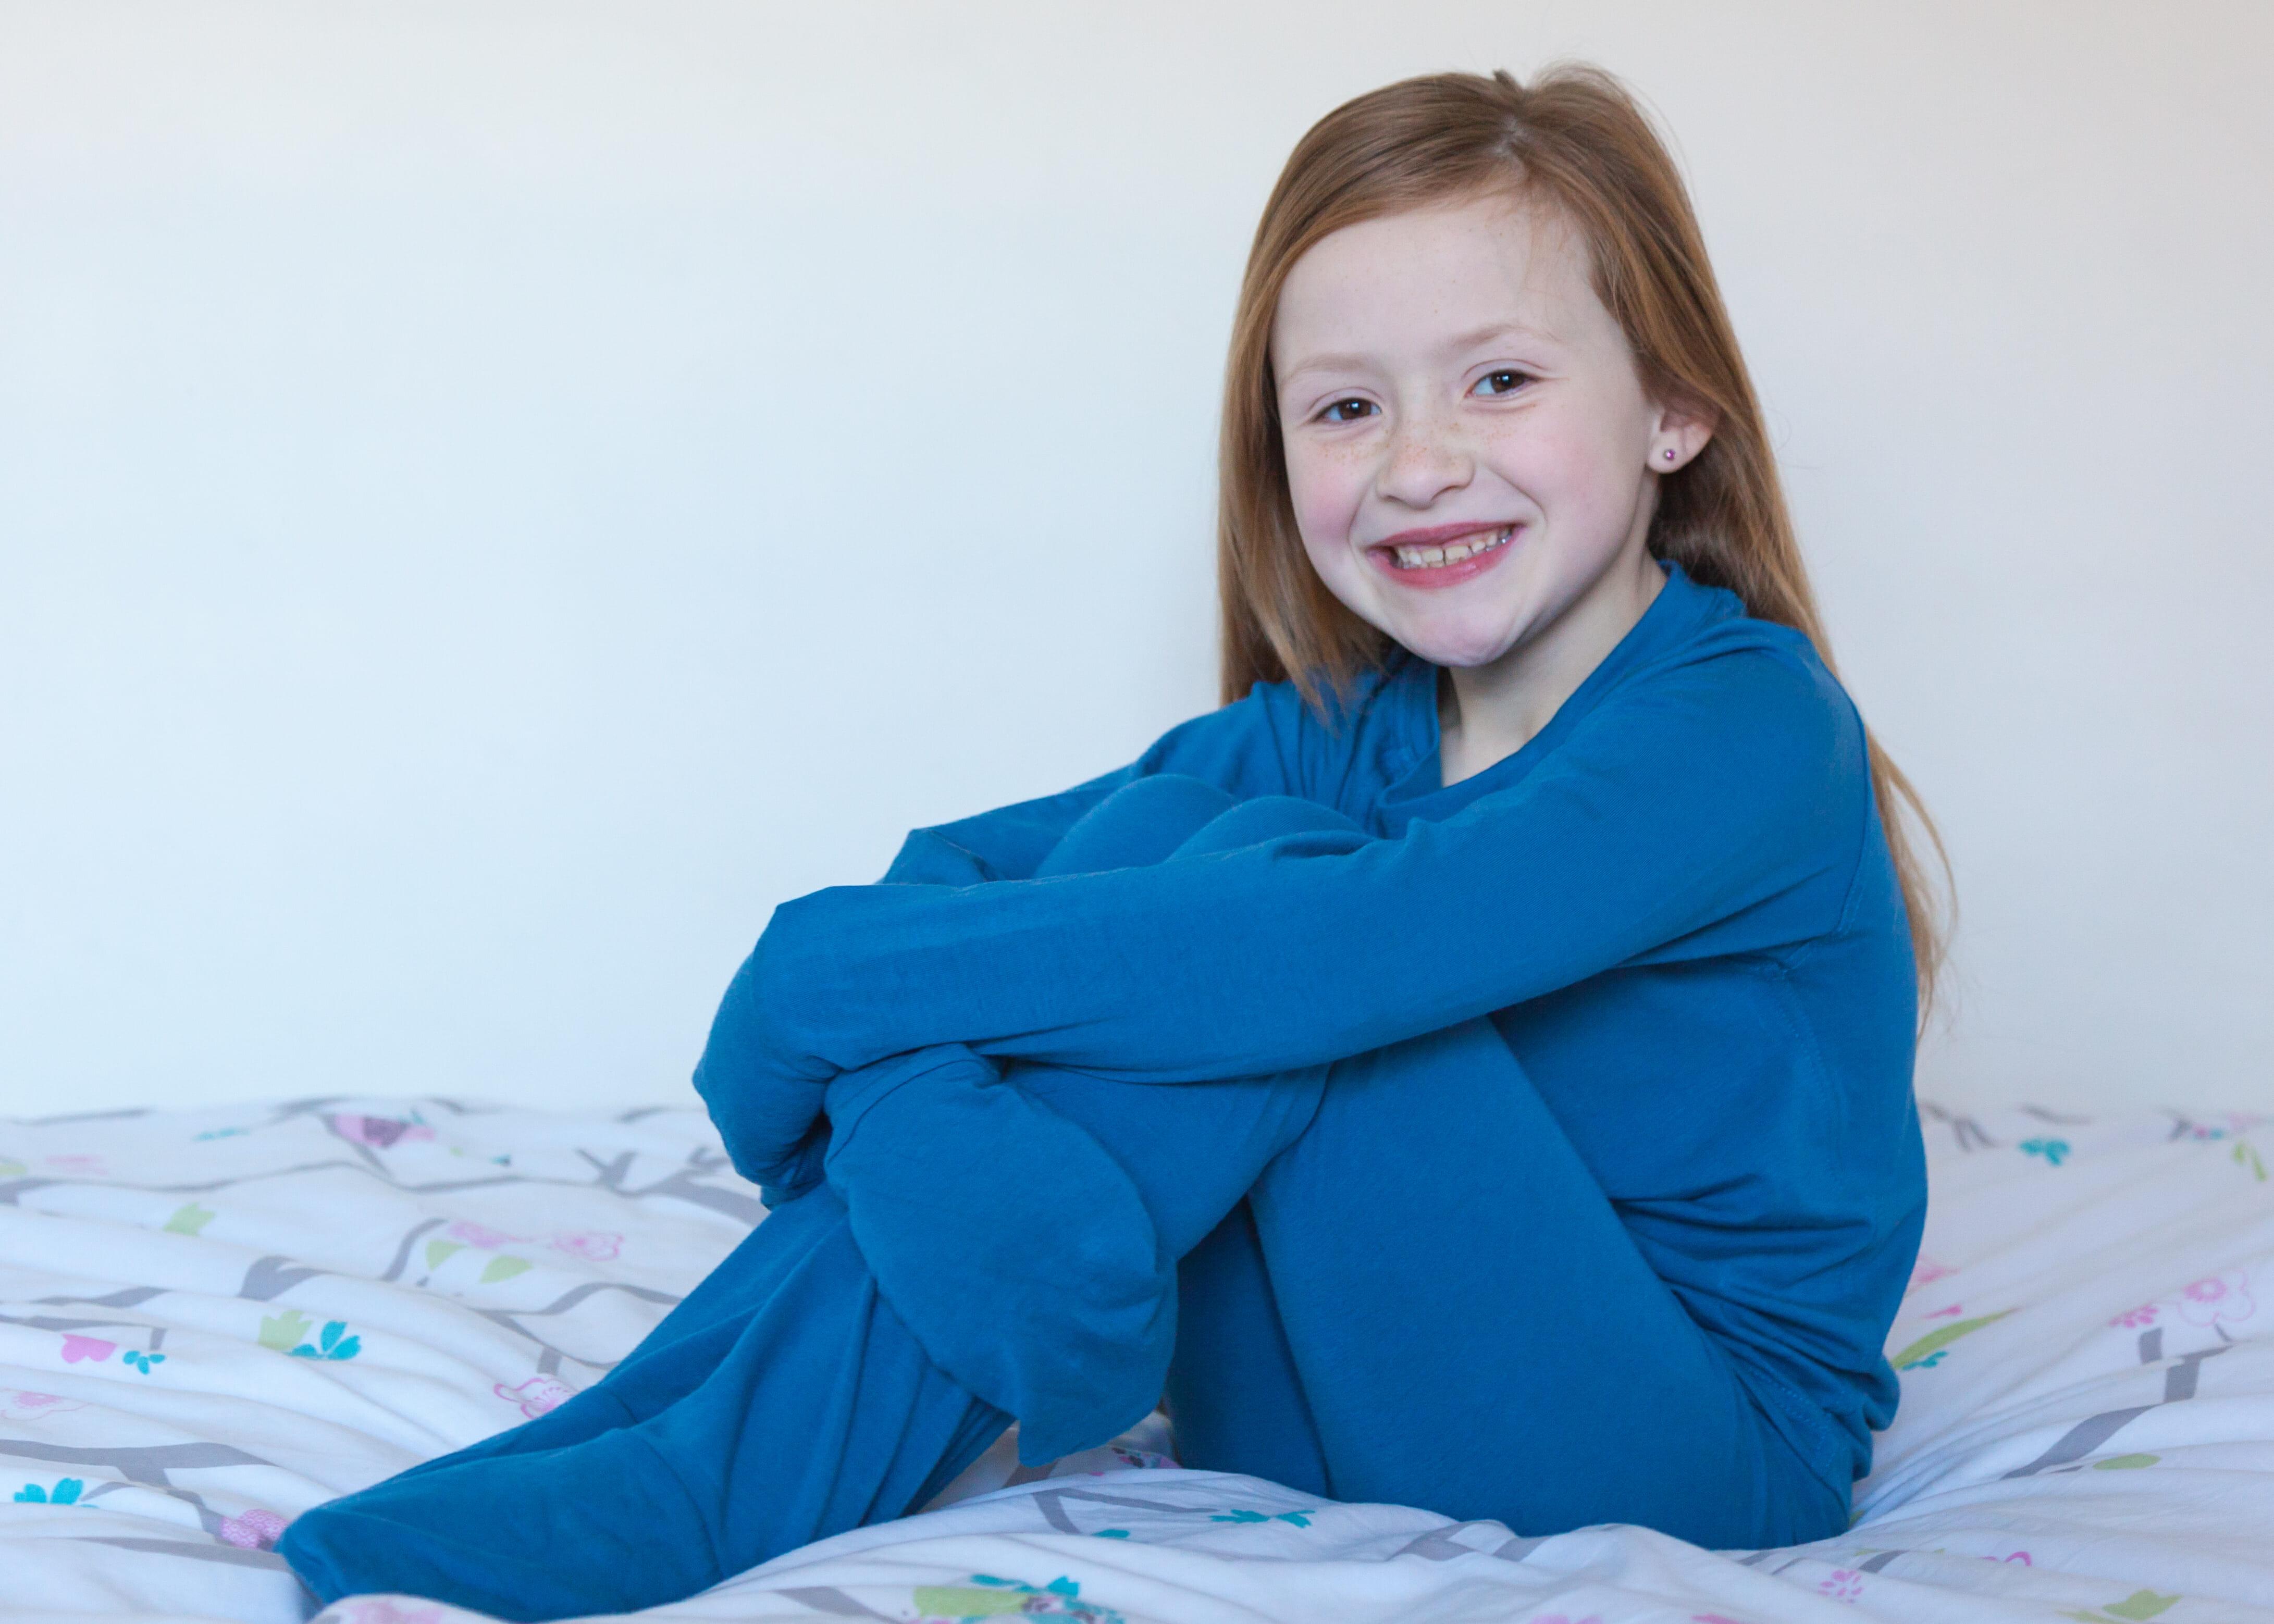 Eczemawear mitten T eczema clothing for kids